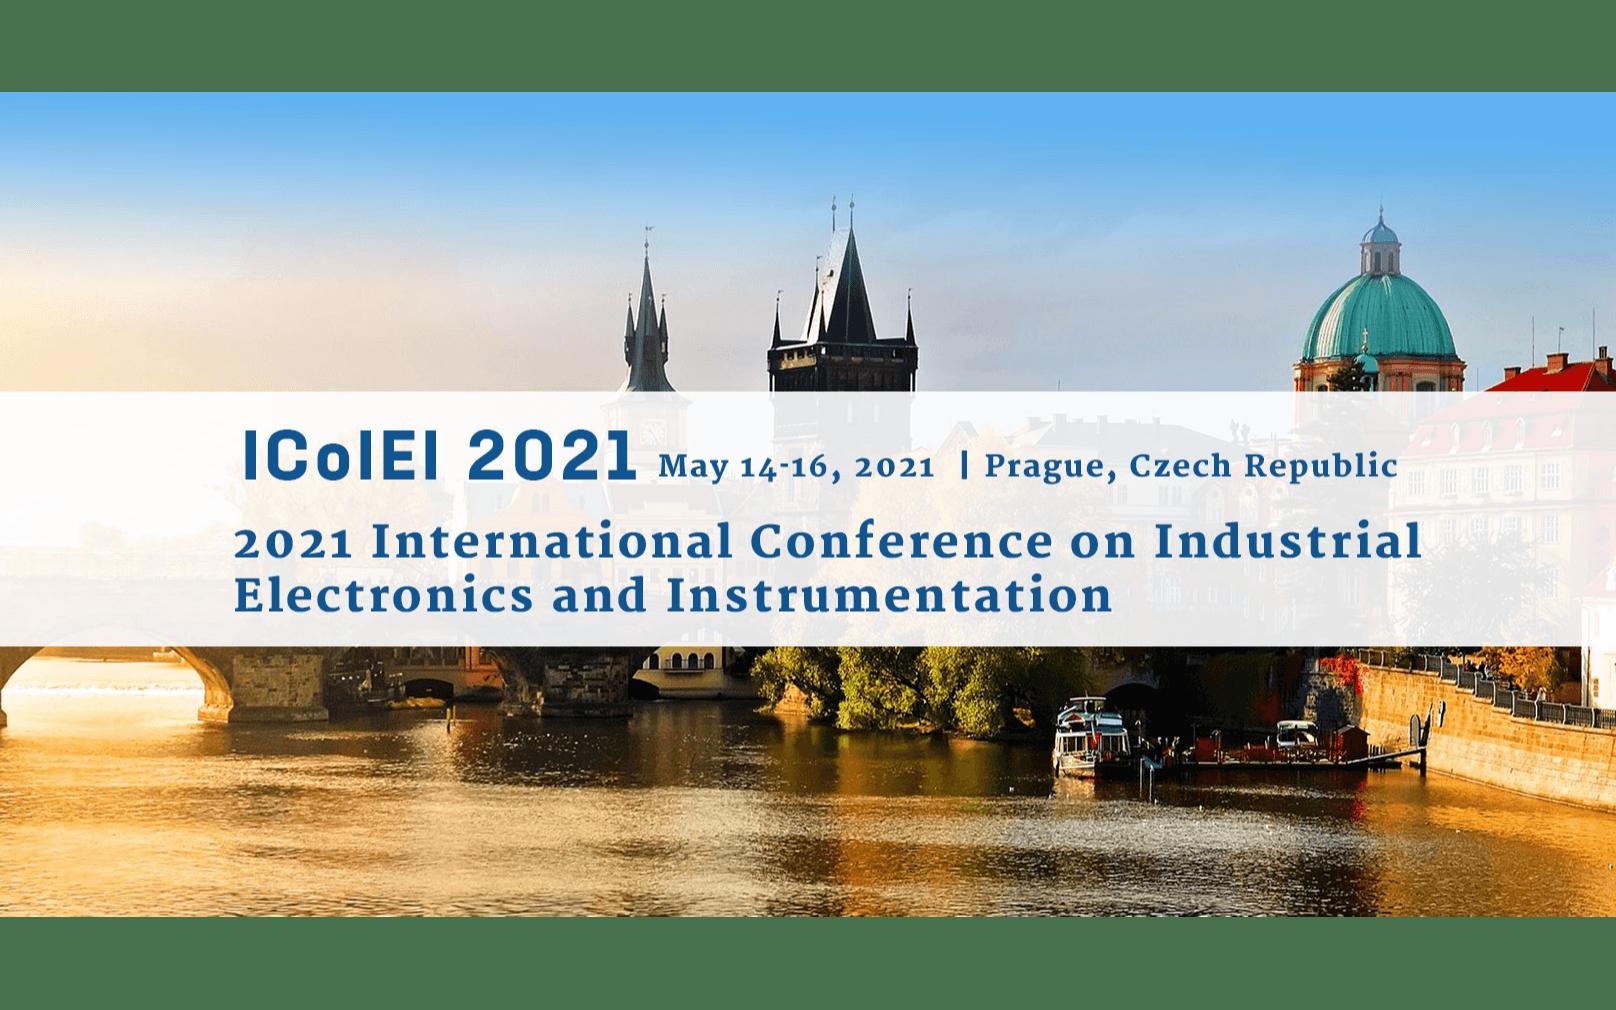 【EI检索】2021年工业电子与仪器仪表国际会议(ICoIEI 2021)